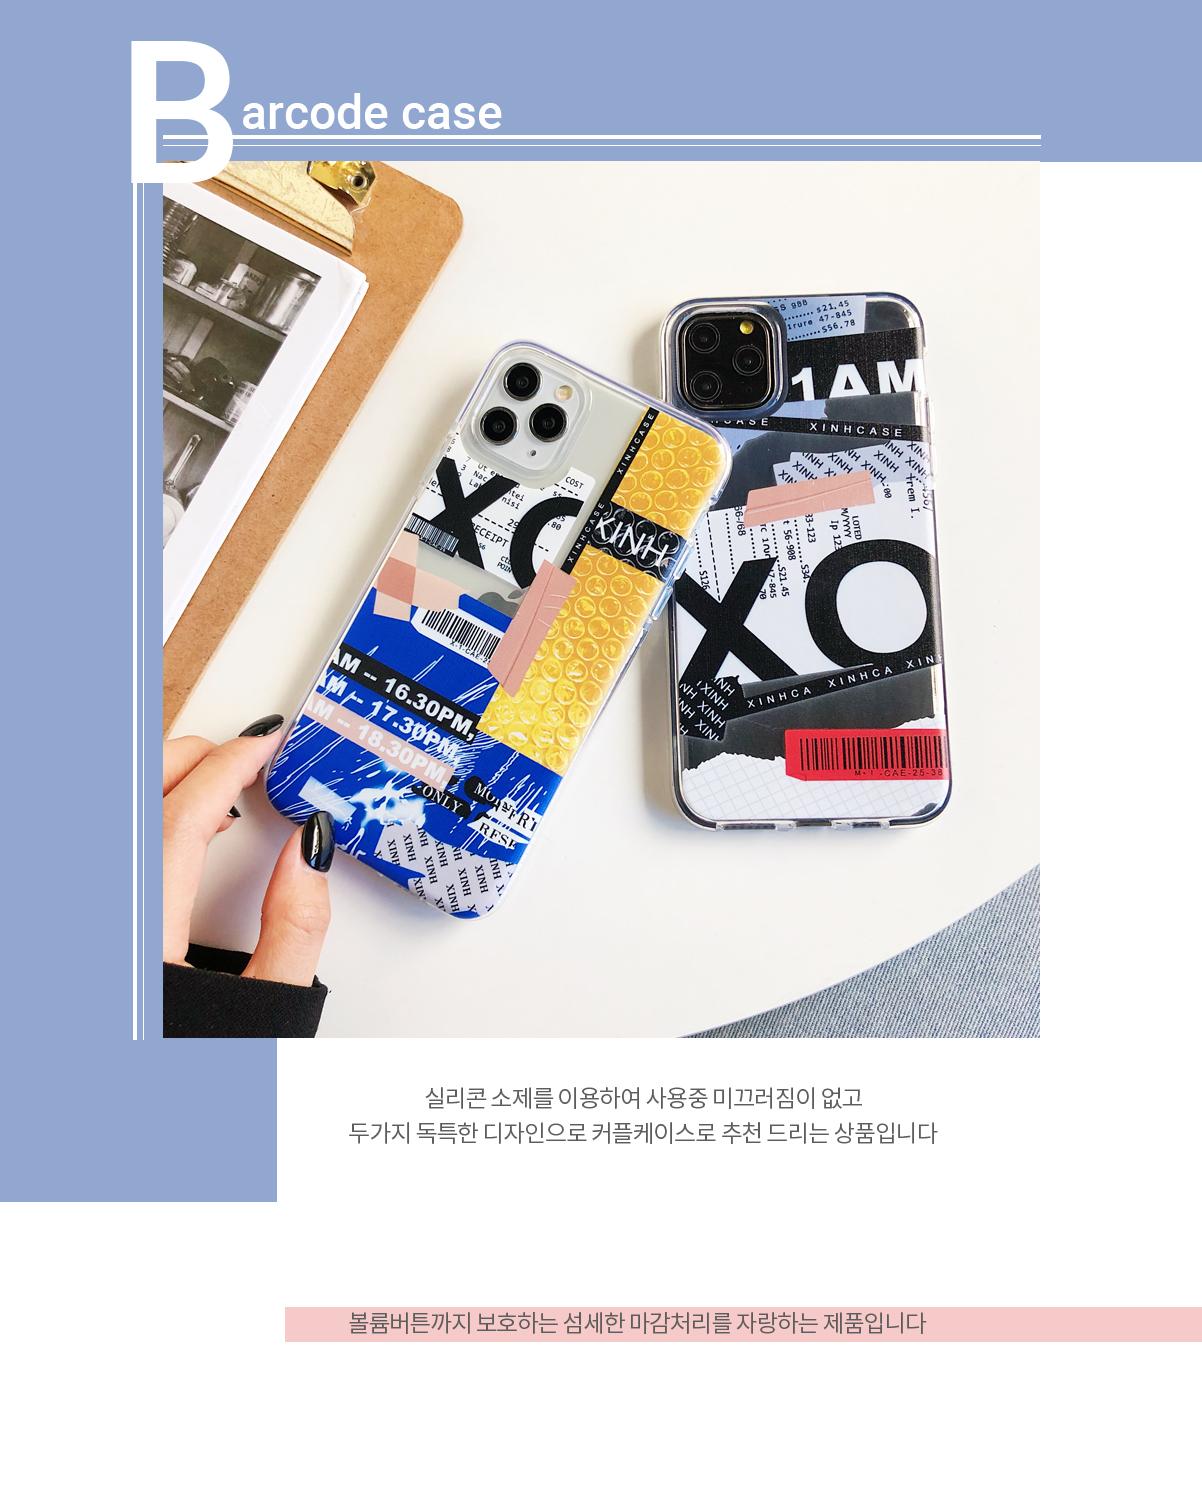 Mr. Tongjun Jun iPhone 11 Pro Max iPhone XS iPhone XR iPhone 8 barcode case